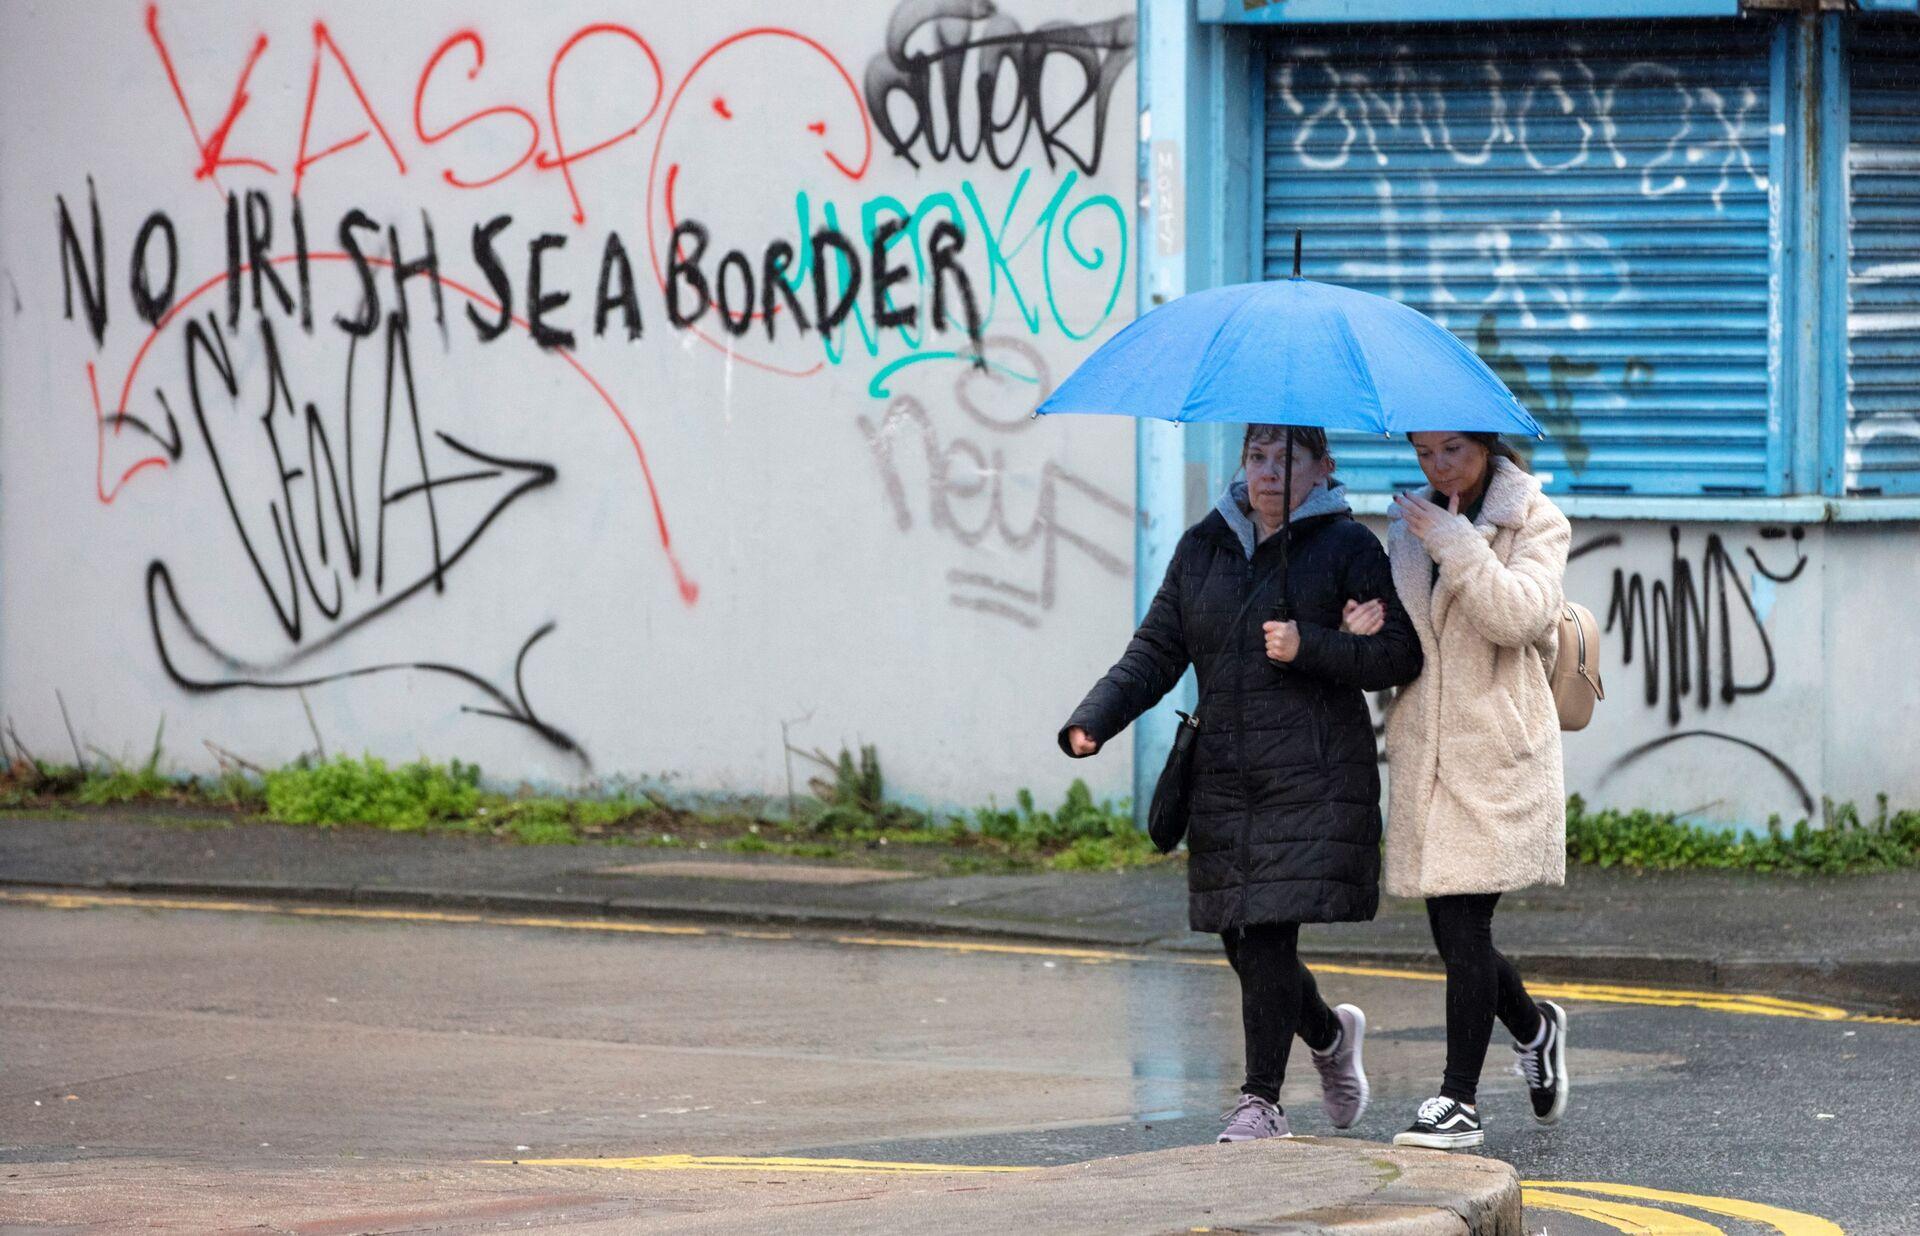 Graffiti in a loyalist area of south Belfast, Northern Ireland against an Irish sea border is seen on February 2, 2021. - Sputnik International, 1920, 14.09.2021